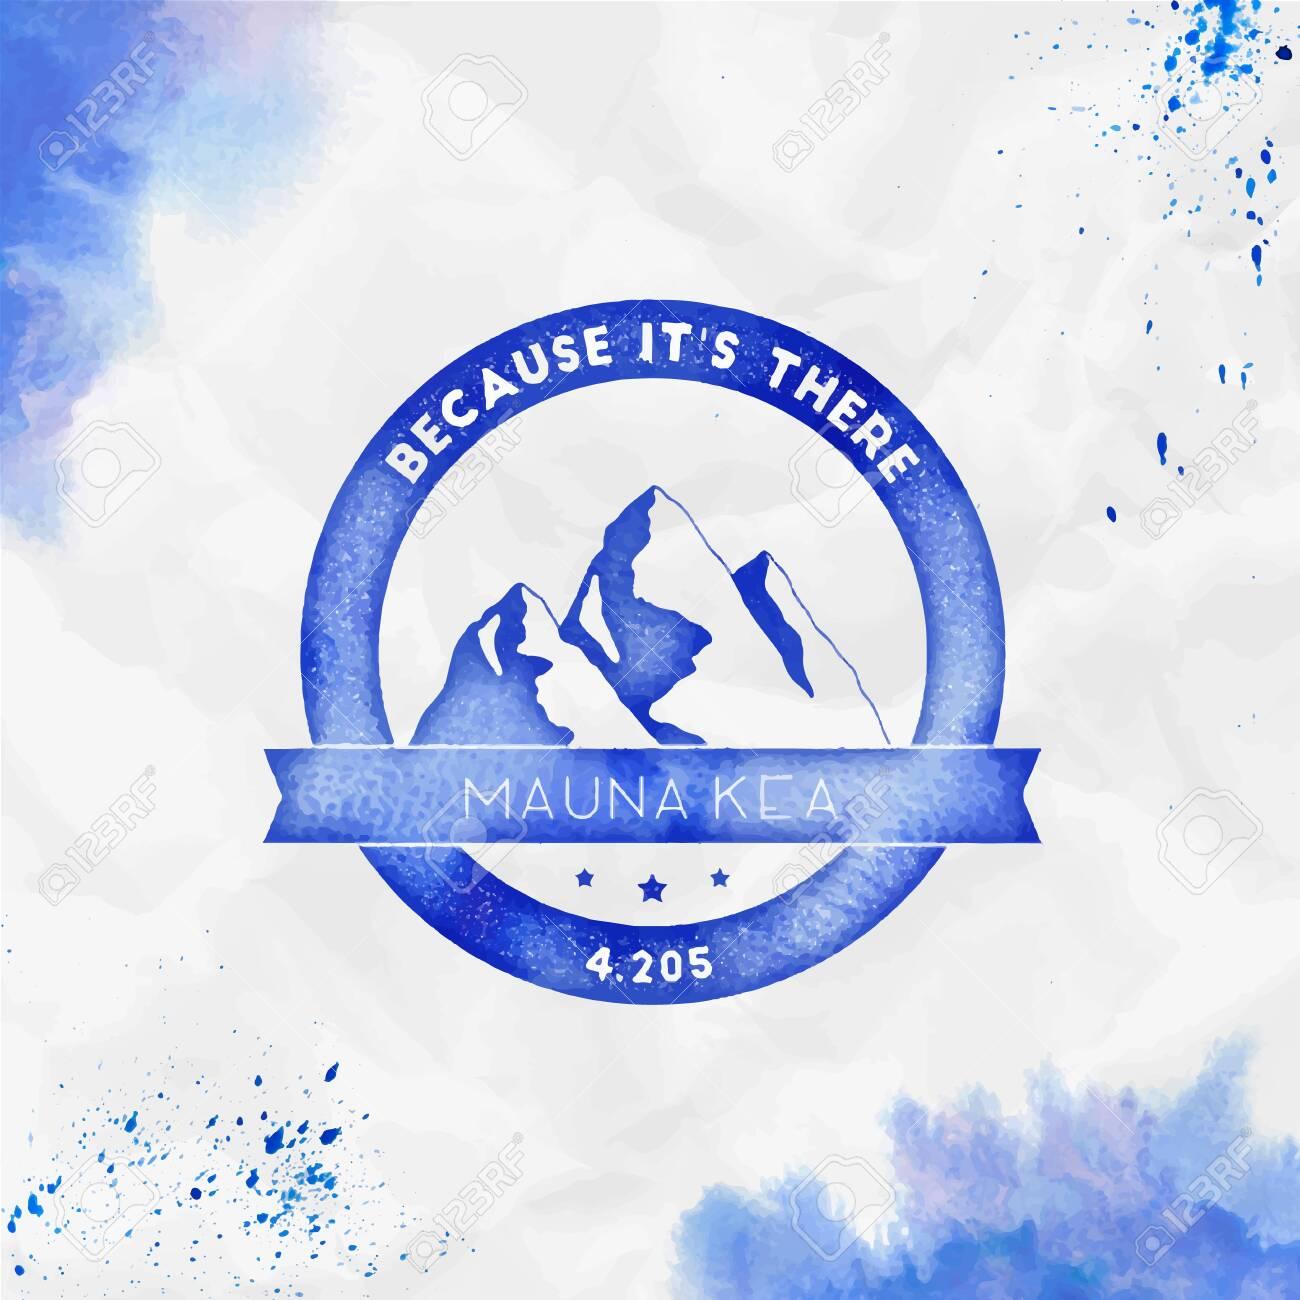 Mauna Kea Round climbing blue vector insignia  Mauna Kea in